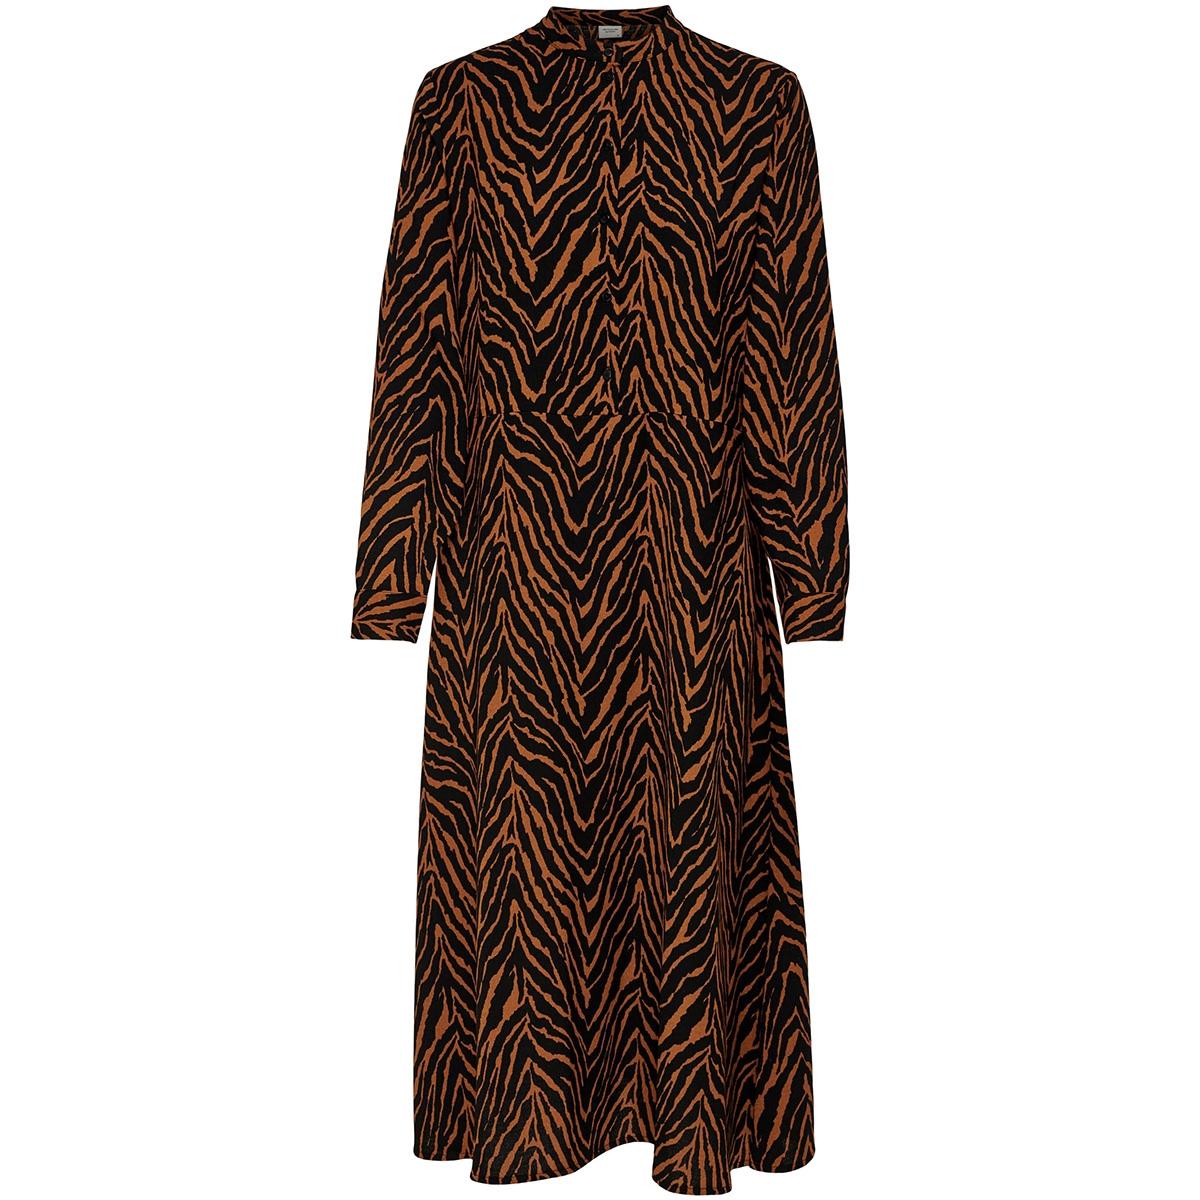 jdylucy l/s dress denim wvn 15185149 jacqueline de yong jurk black/sugar almond